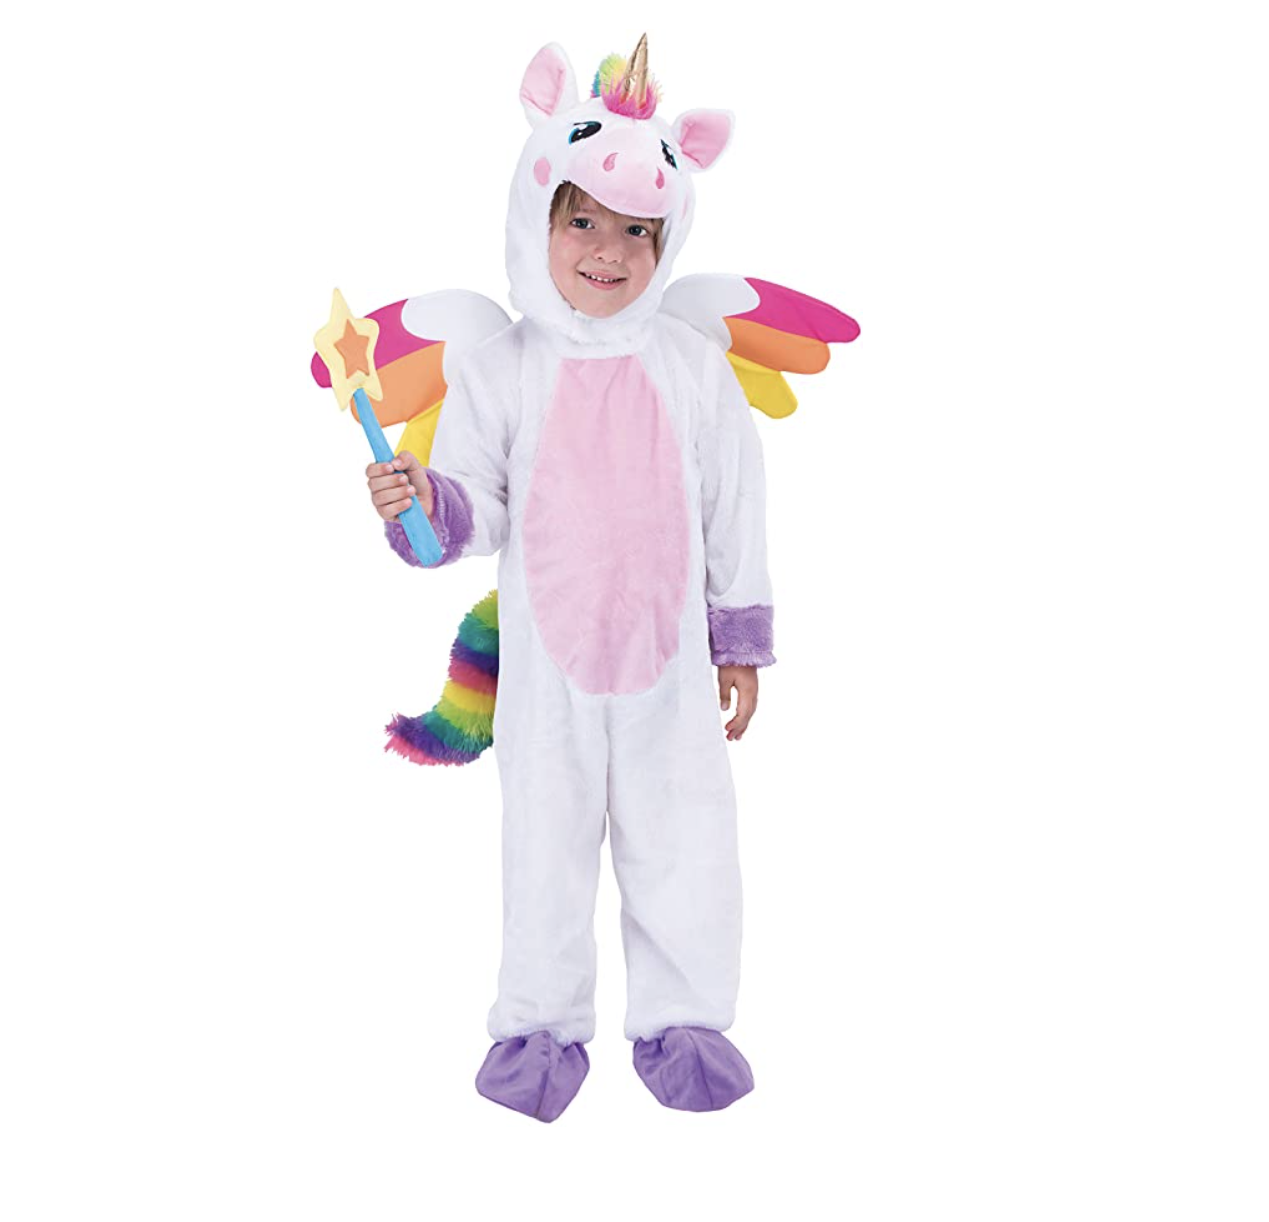 Kid in a unicorn costume